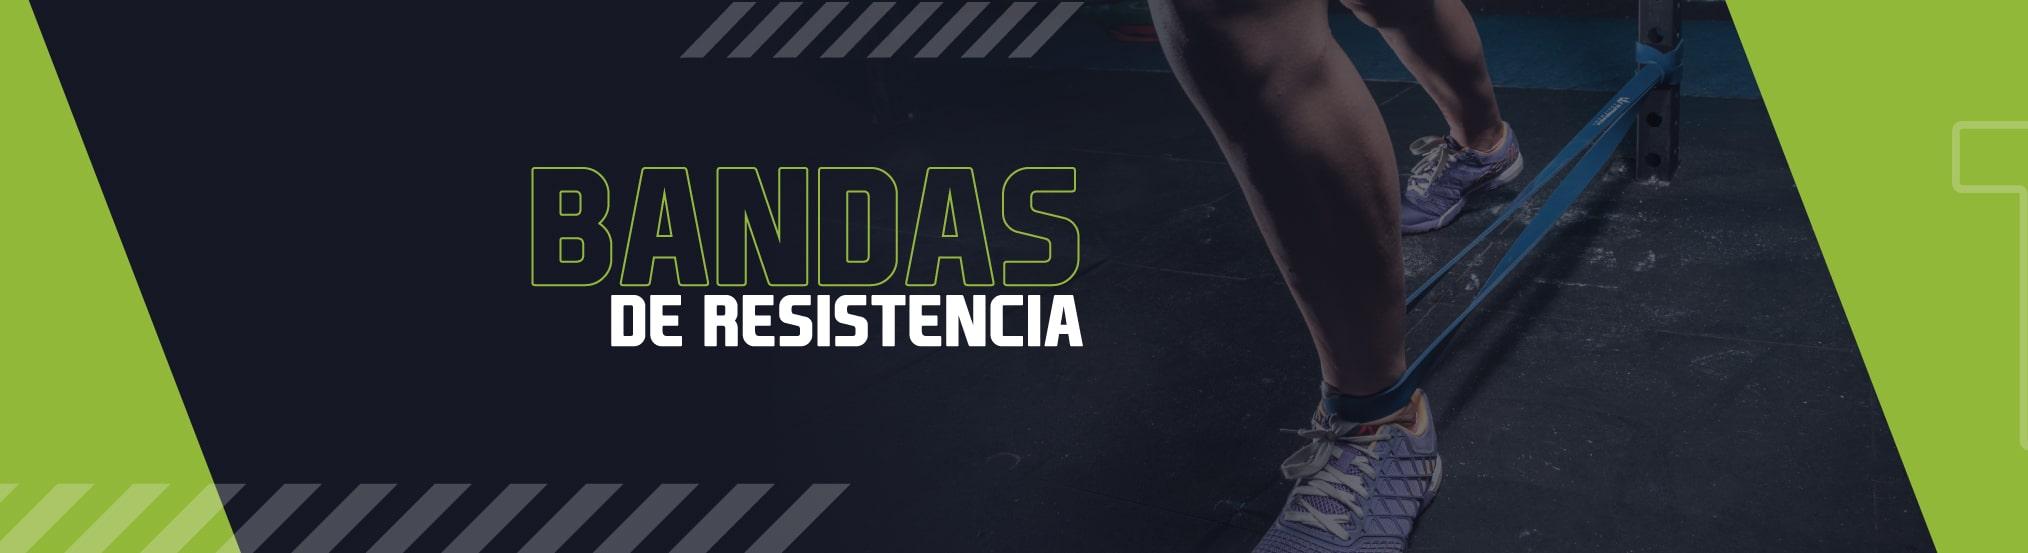 B-BANDAS-RESISTENCIA-DESK-min